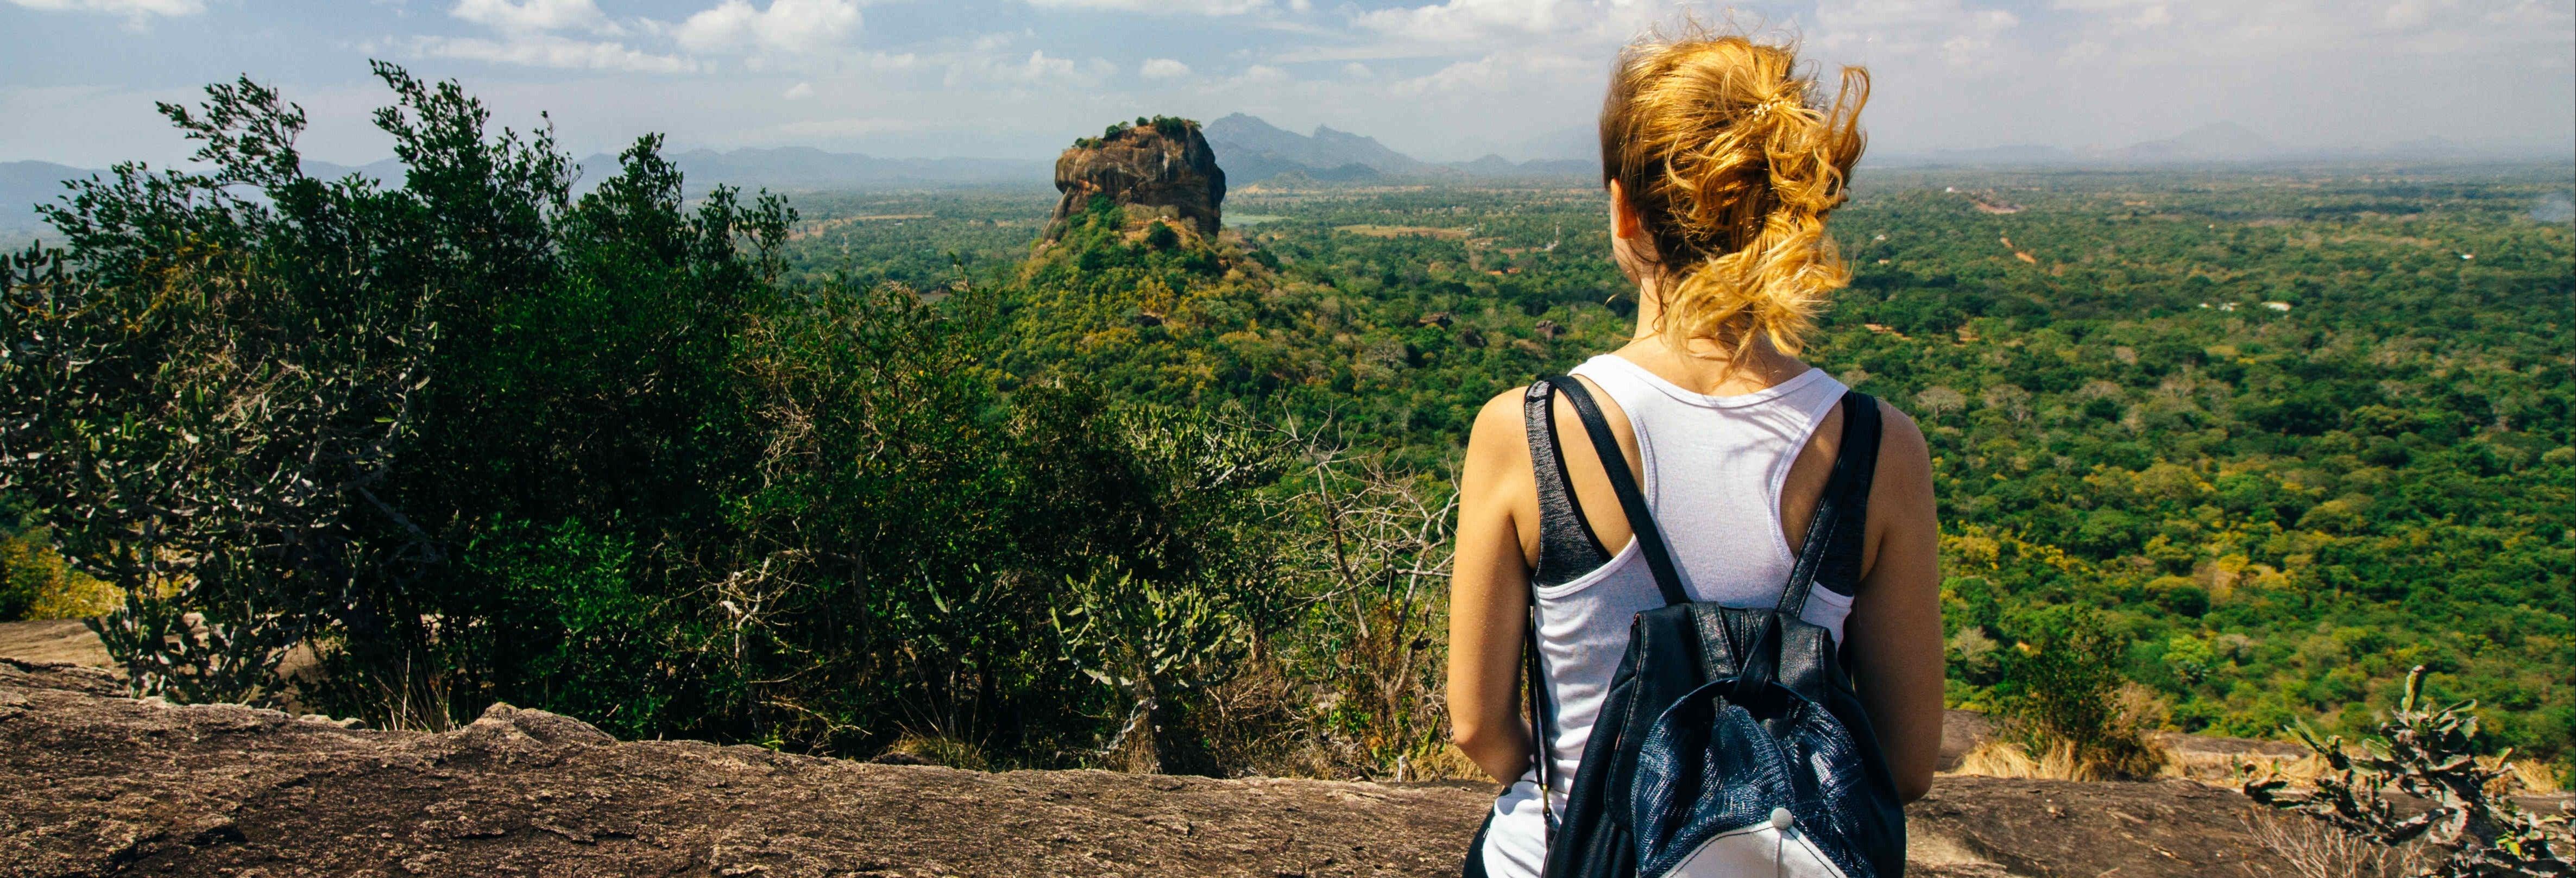 Visite privée à Pidurangala et Hiriwaduna